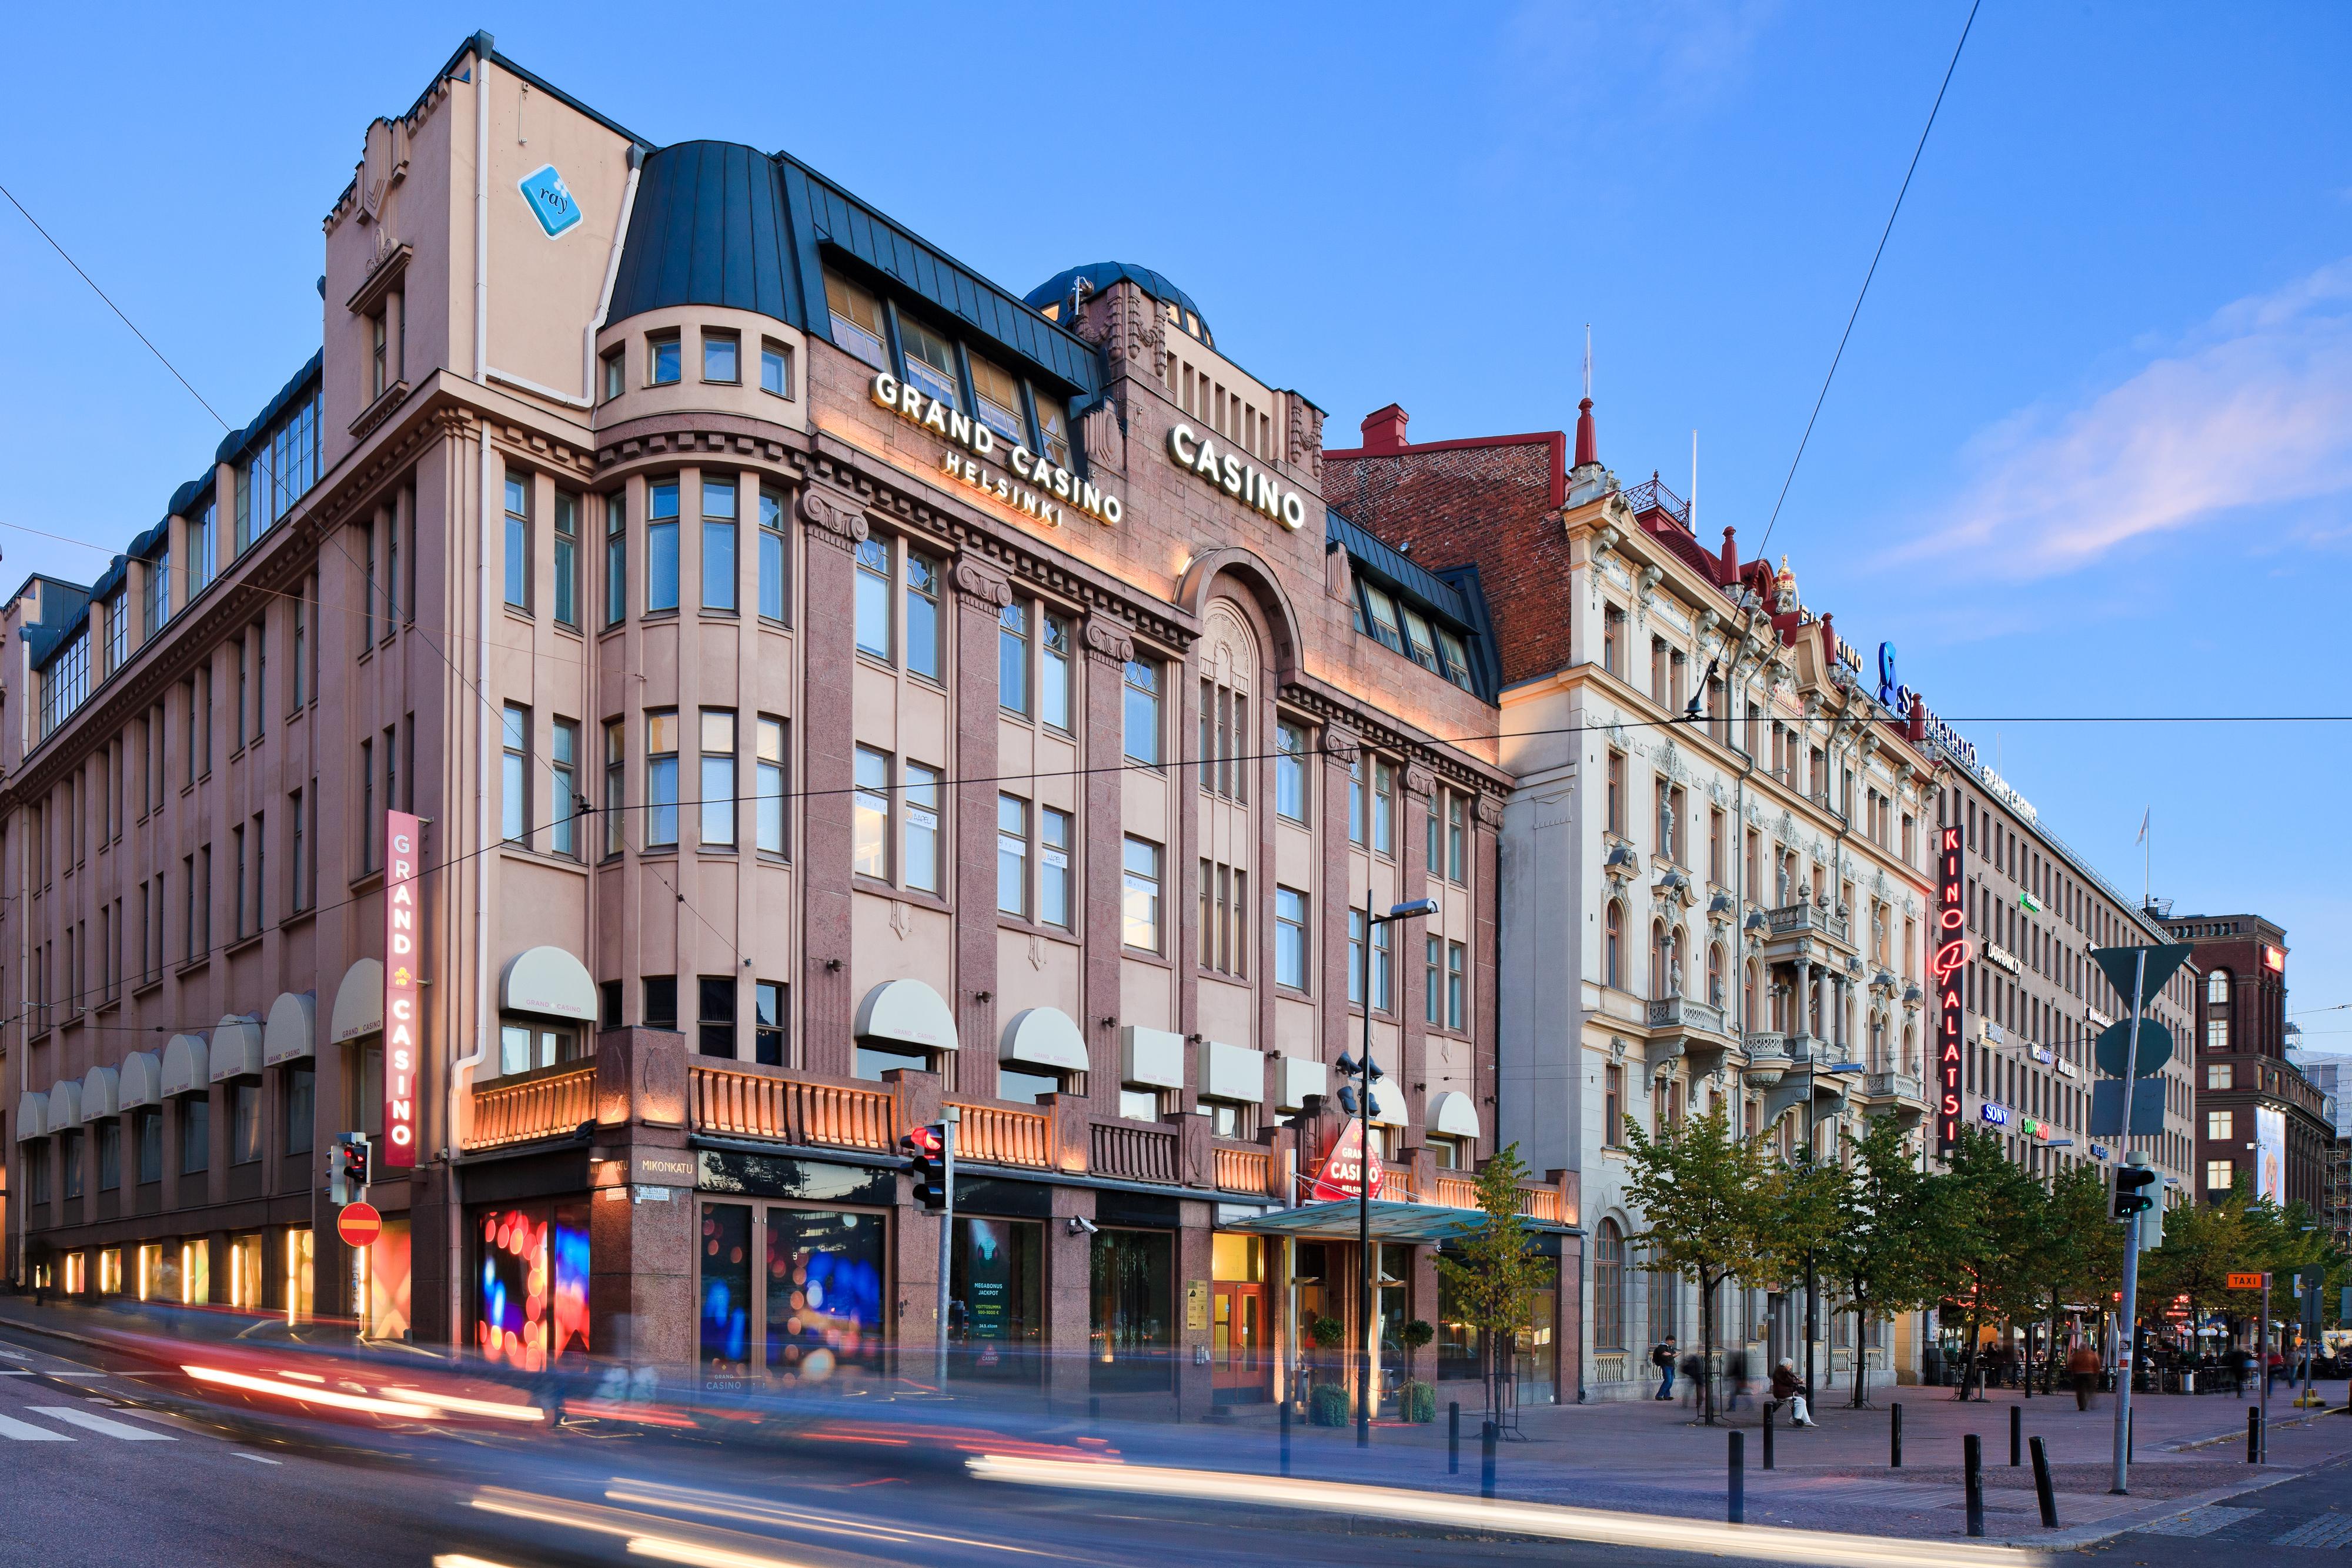 Toimitila, Mikonkatu 19, Kluuvi, Helsinki